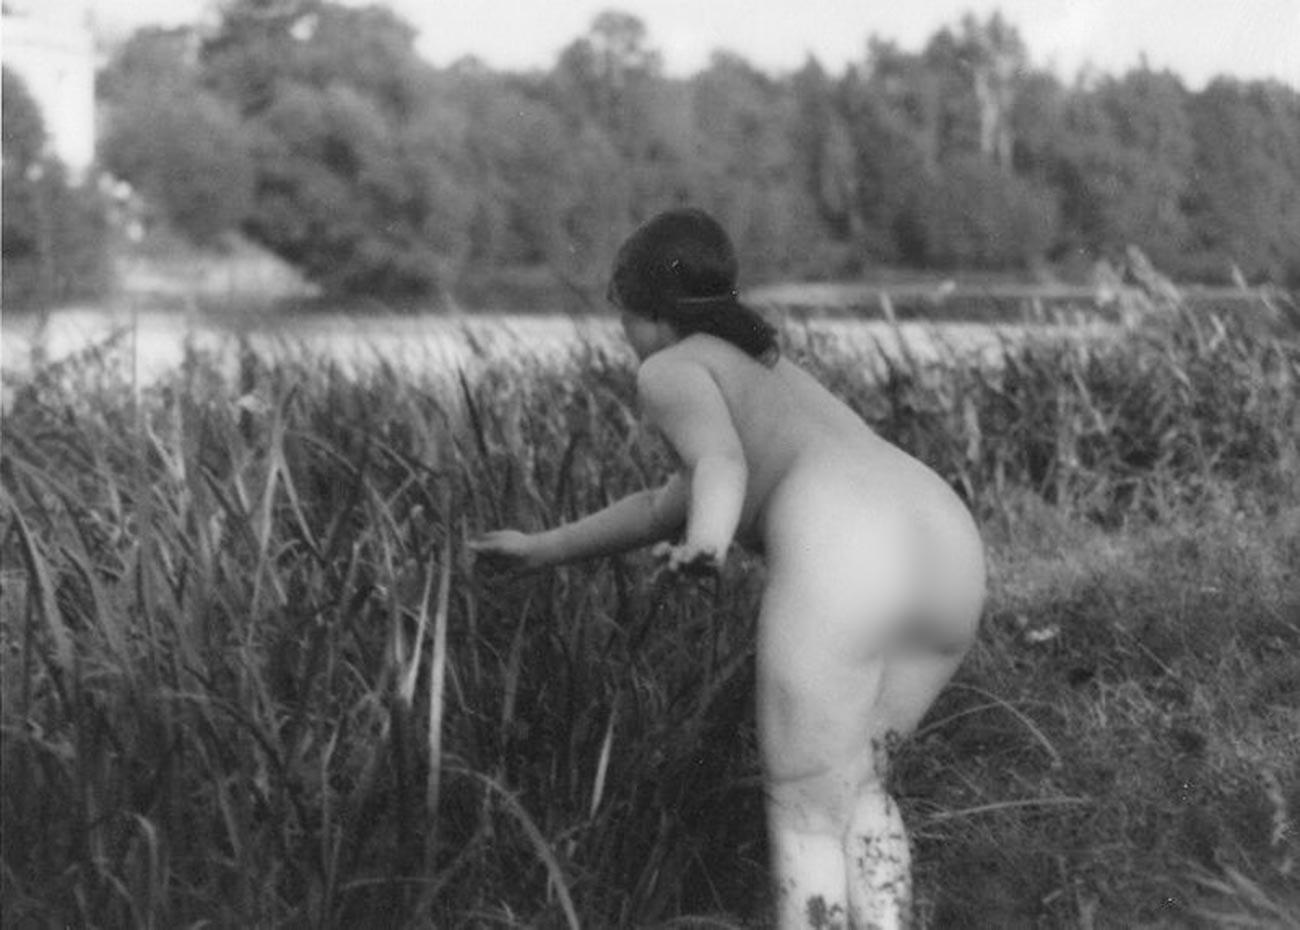 Naga žena, 1920-e